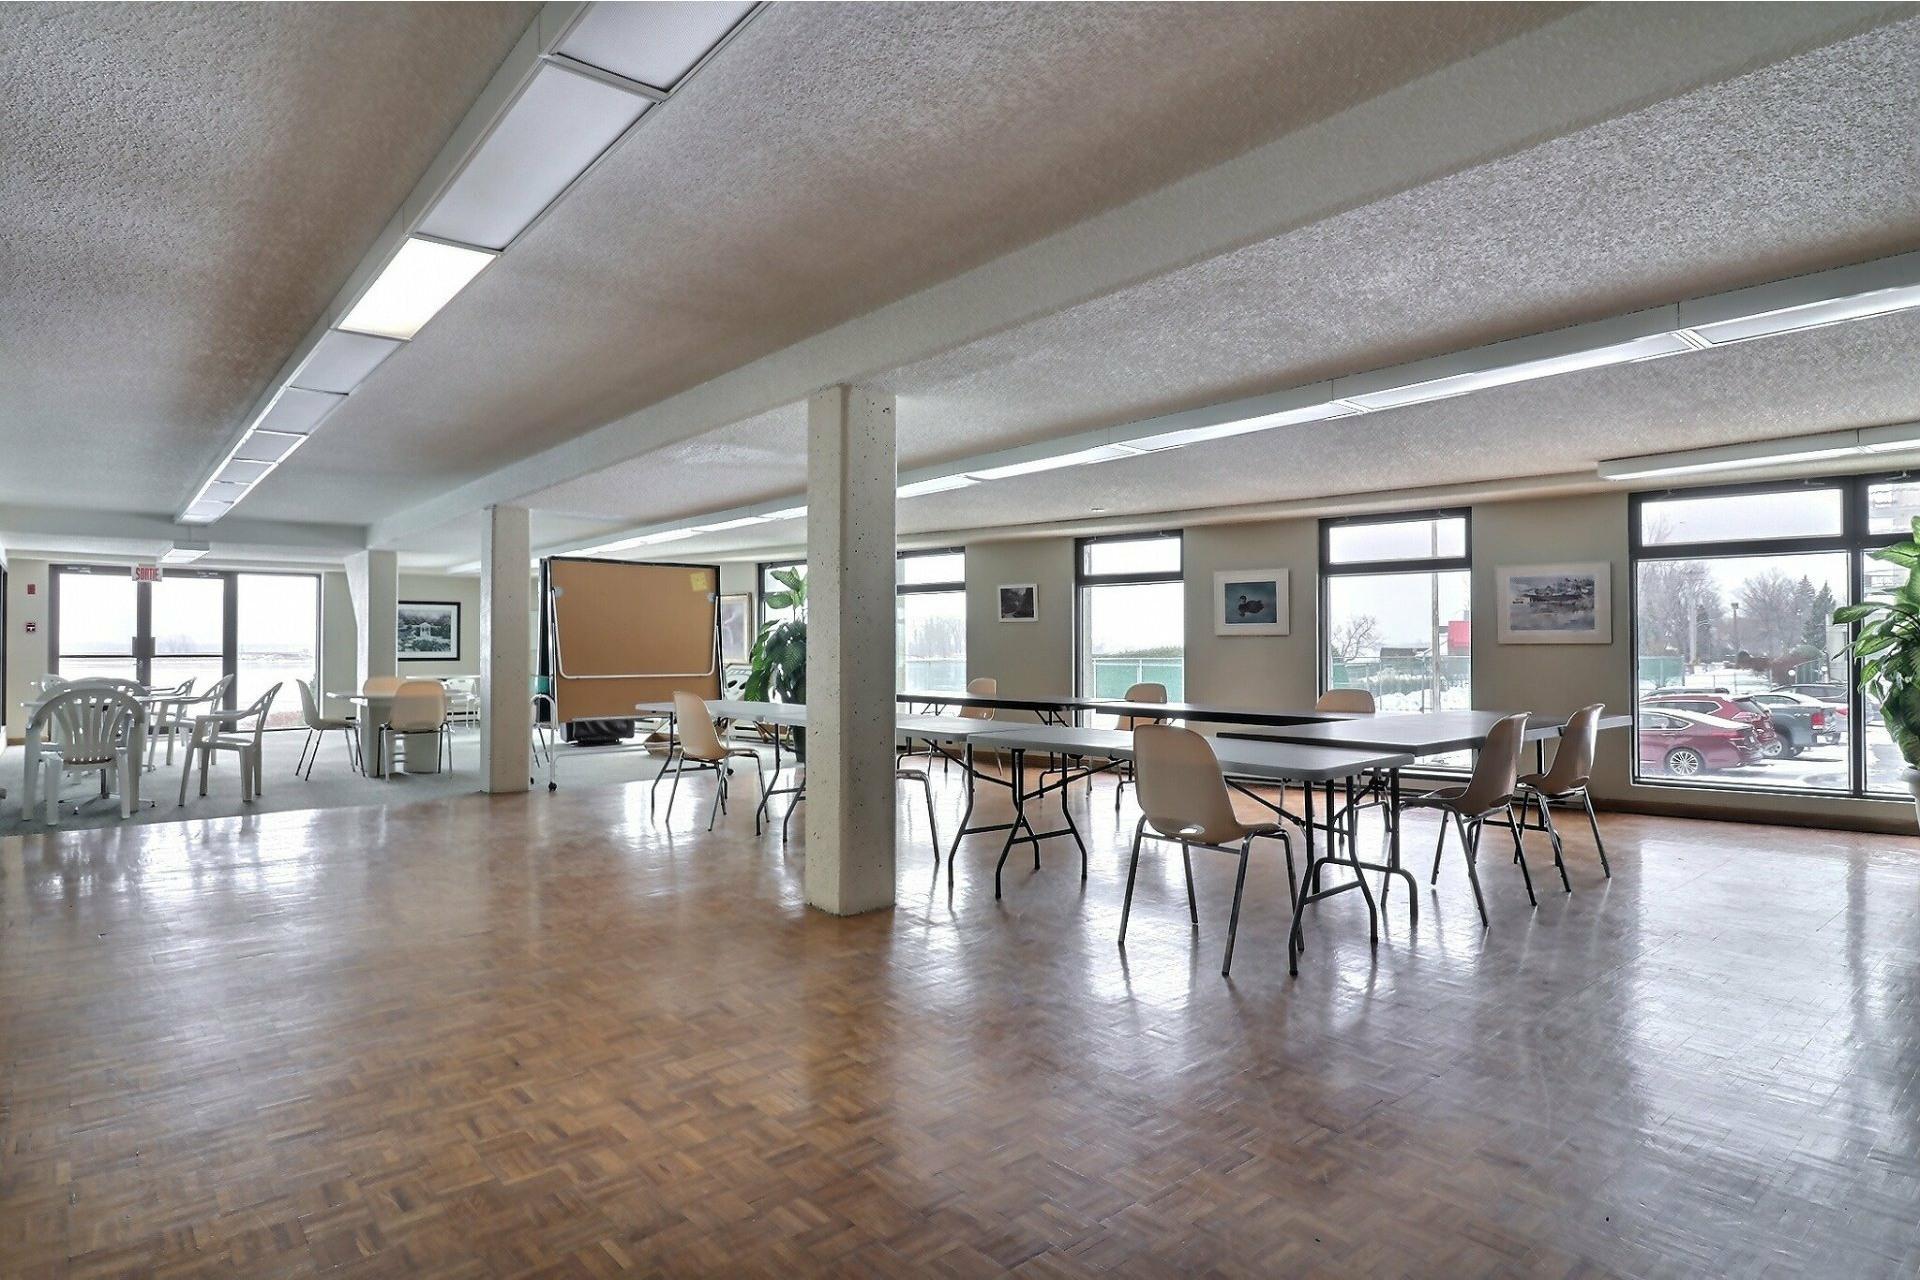 image 24 - Appartement À vendre Repentigny Repentigny  - 9 pièces